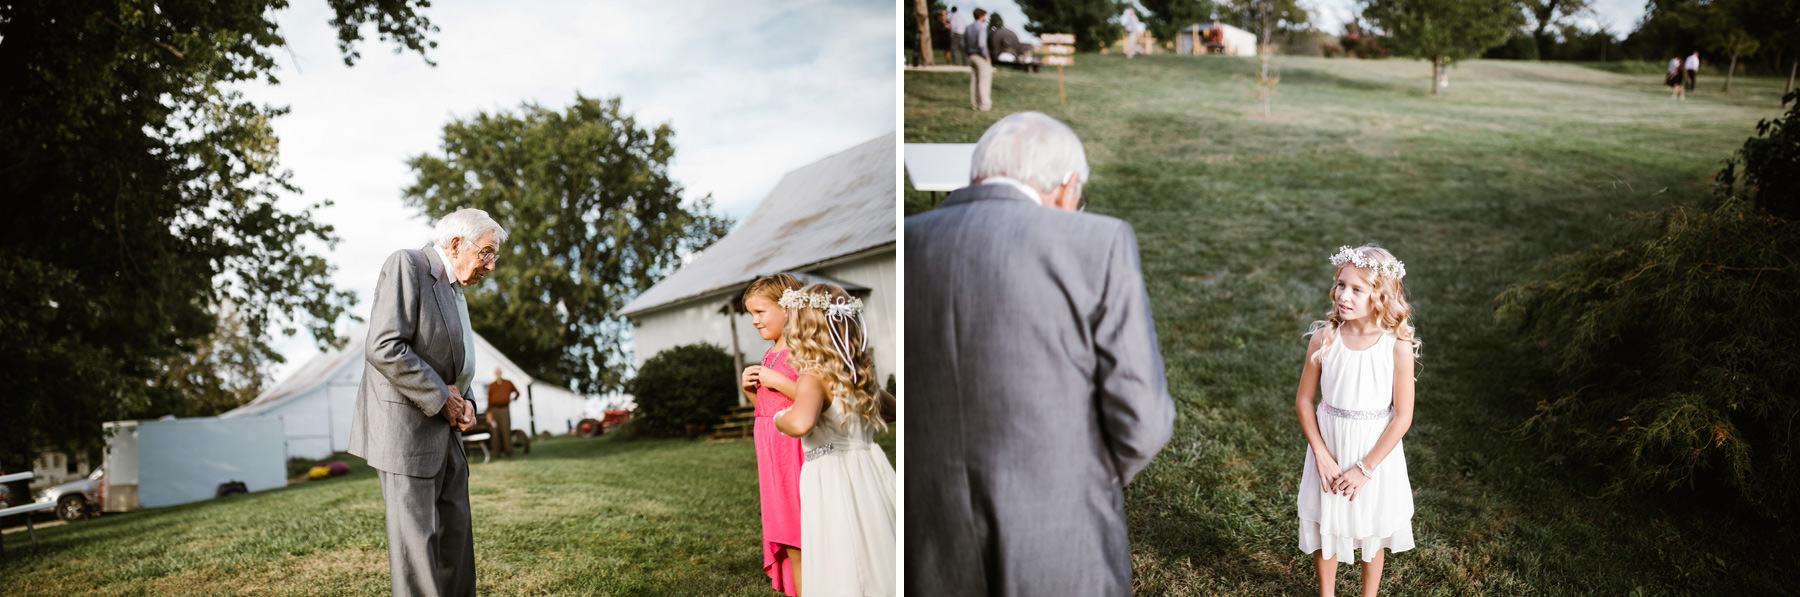 Alldredge Orchard Kansas City_Kindling Wedding Photography BLOG 25.JPG